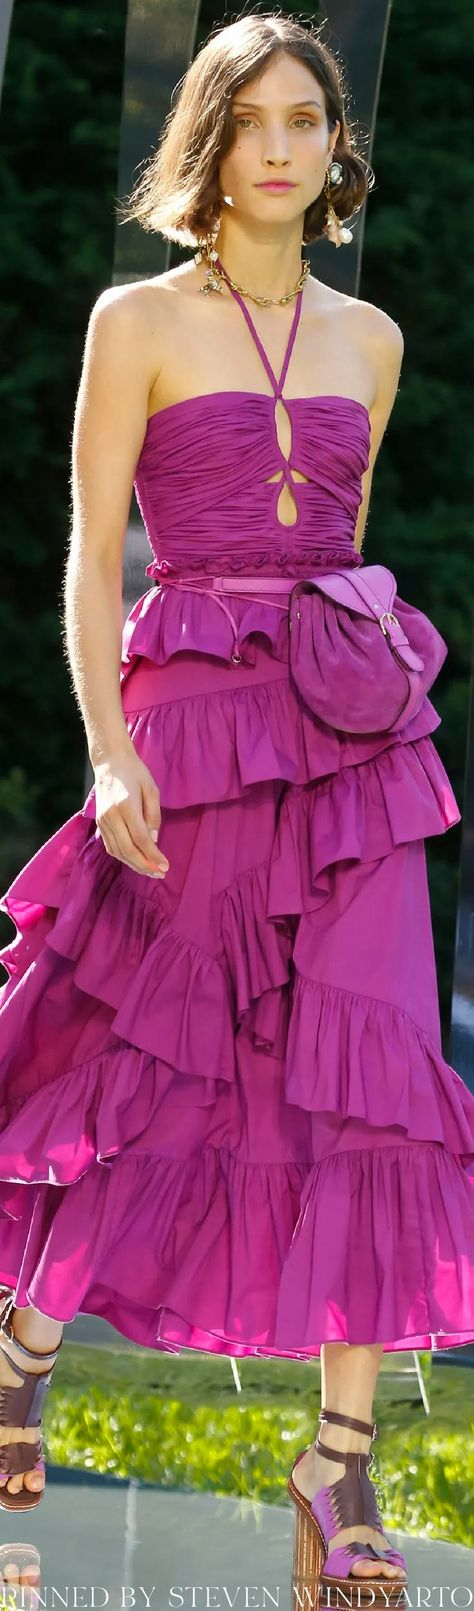 Ulla Johnson Spring 2022 Fashion Show #spring2022 #ss22 #womenswear #ullajohnson